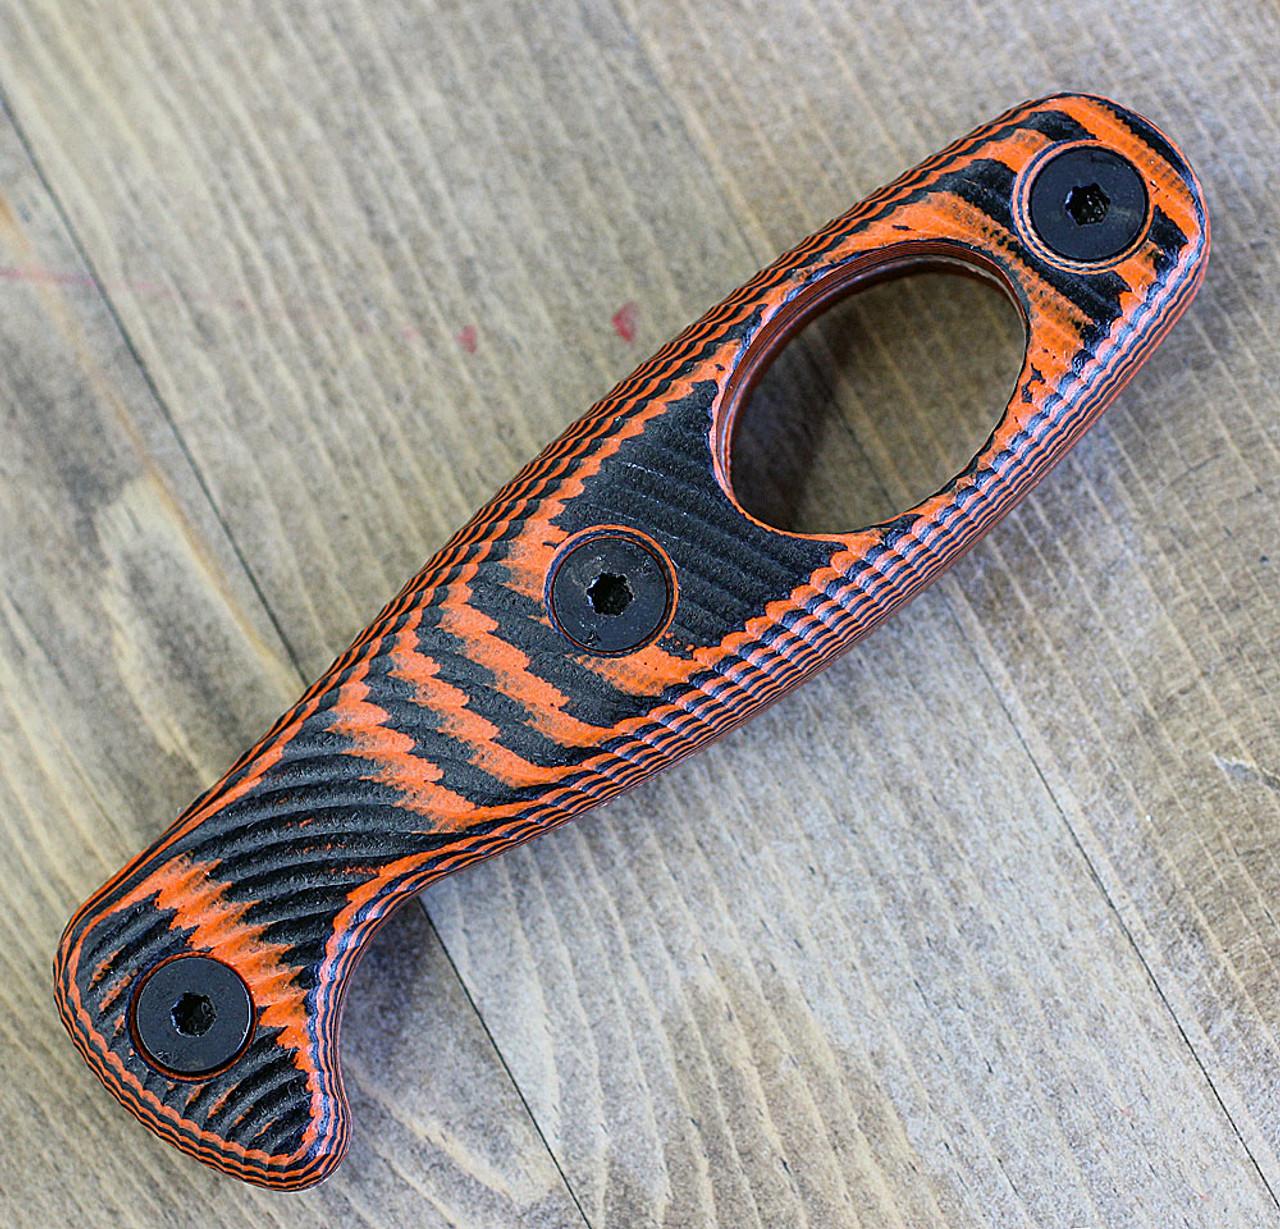 ESEE Xancudo Orange / Black G-10 3D Handle